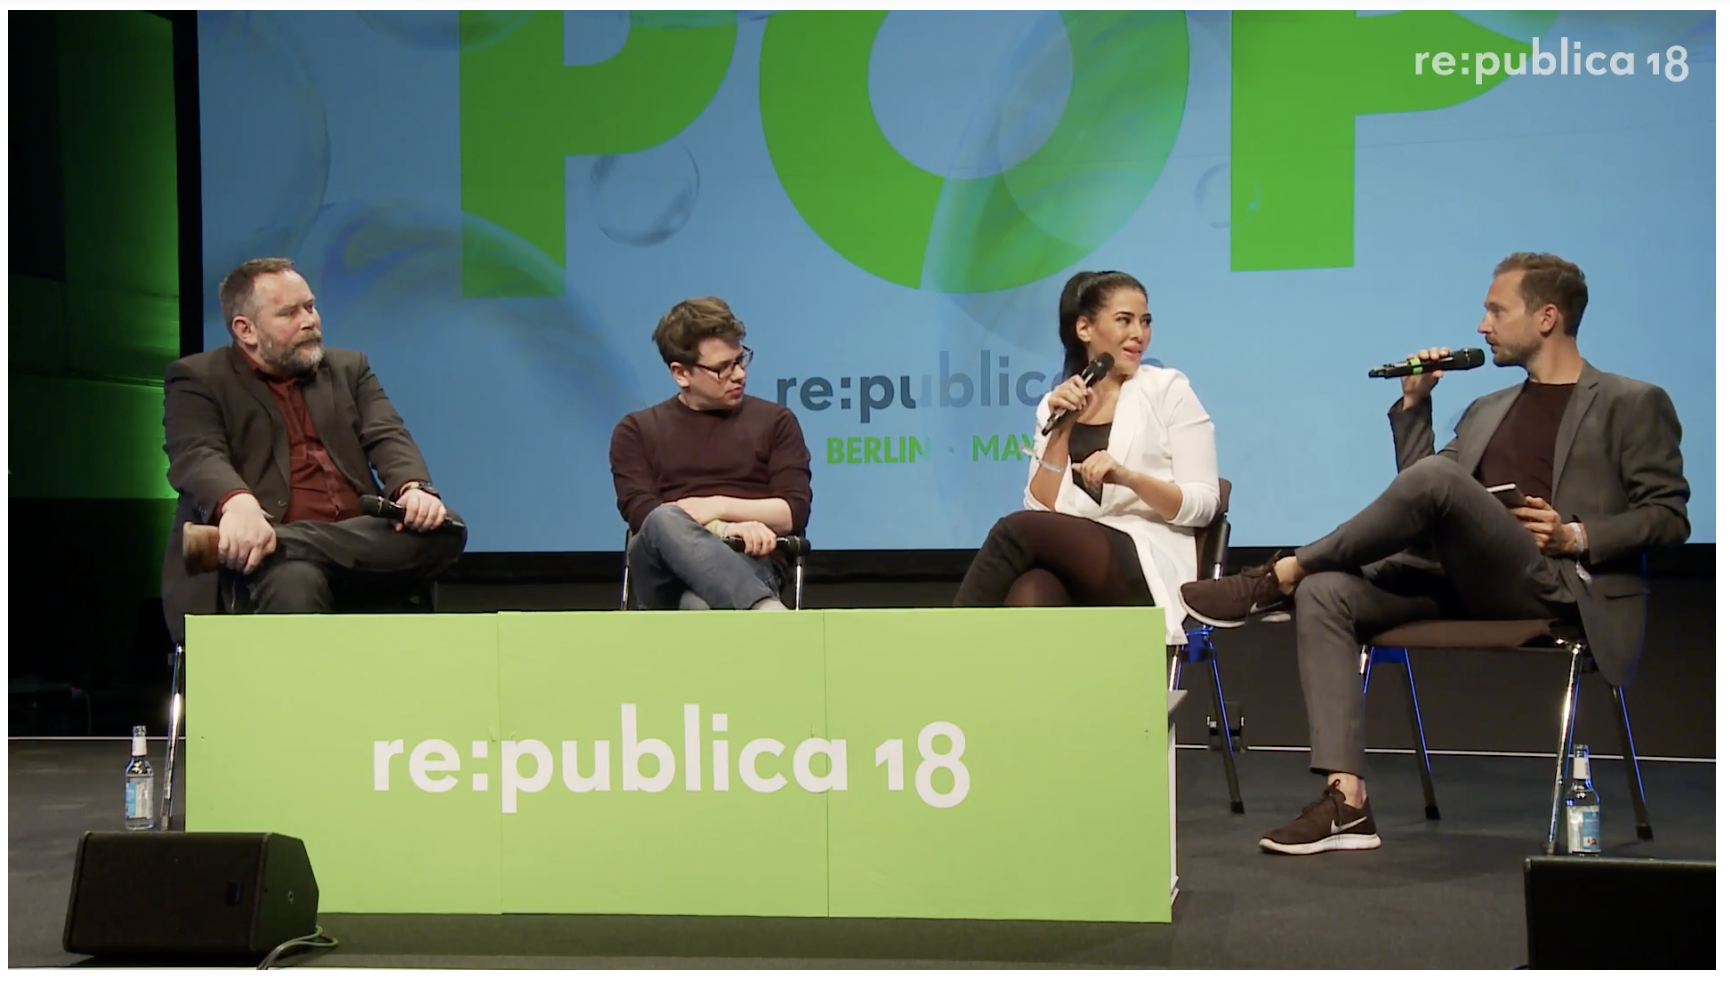 Re:publica18